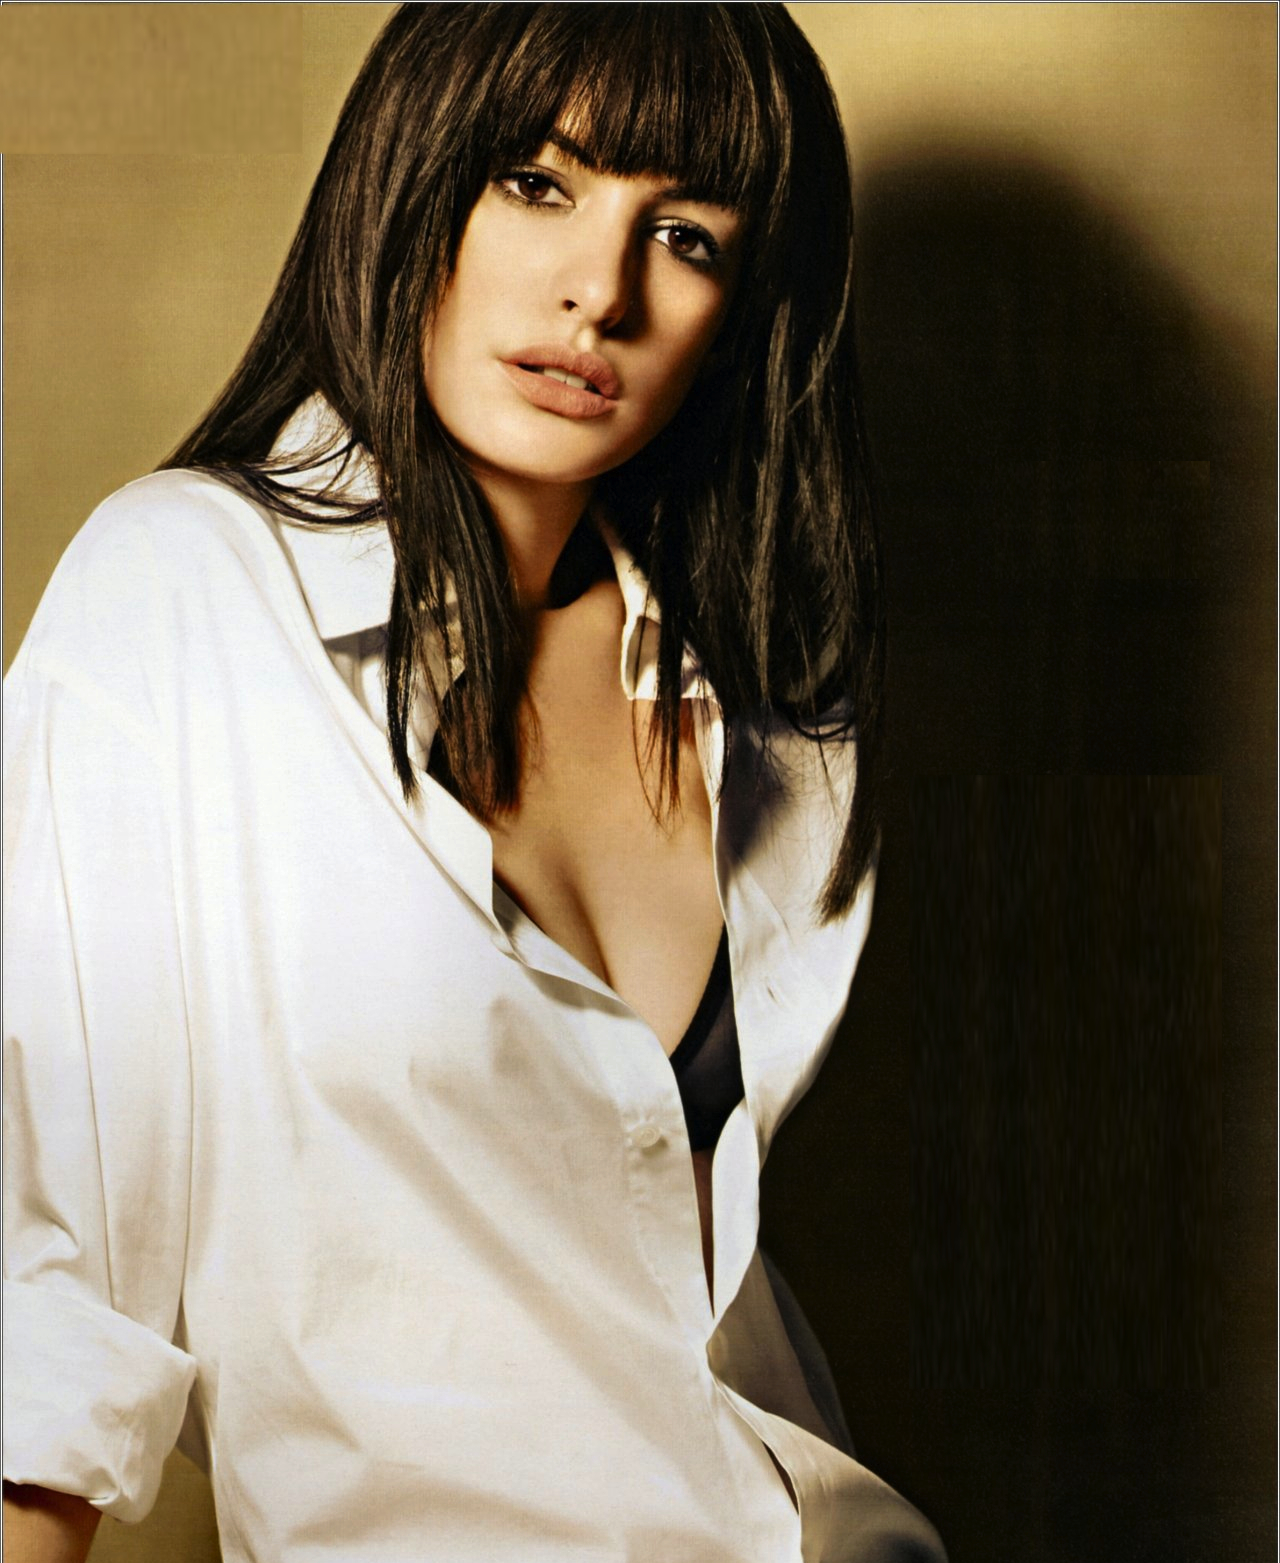 Actrees Celebrity: November 2010